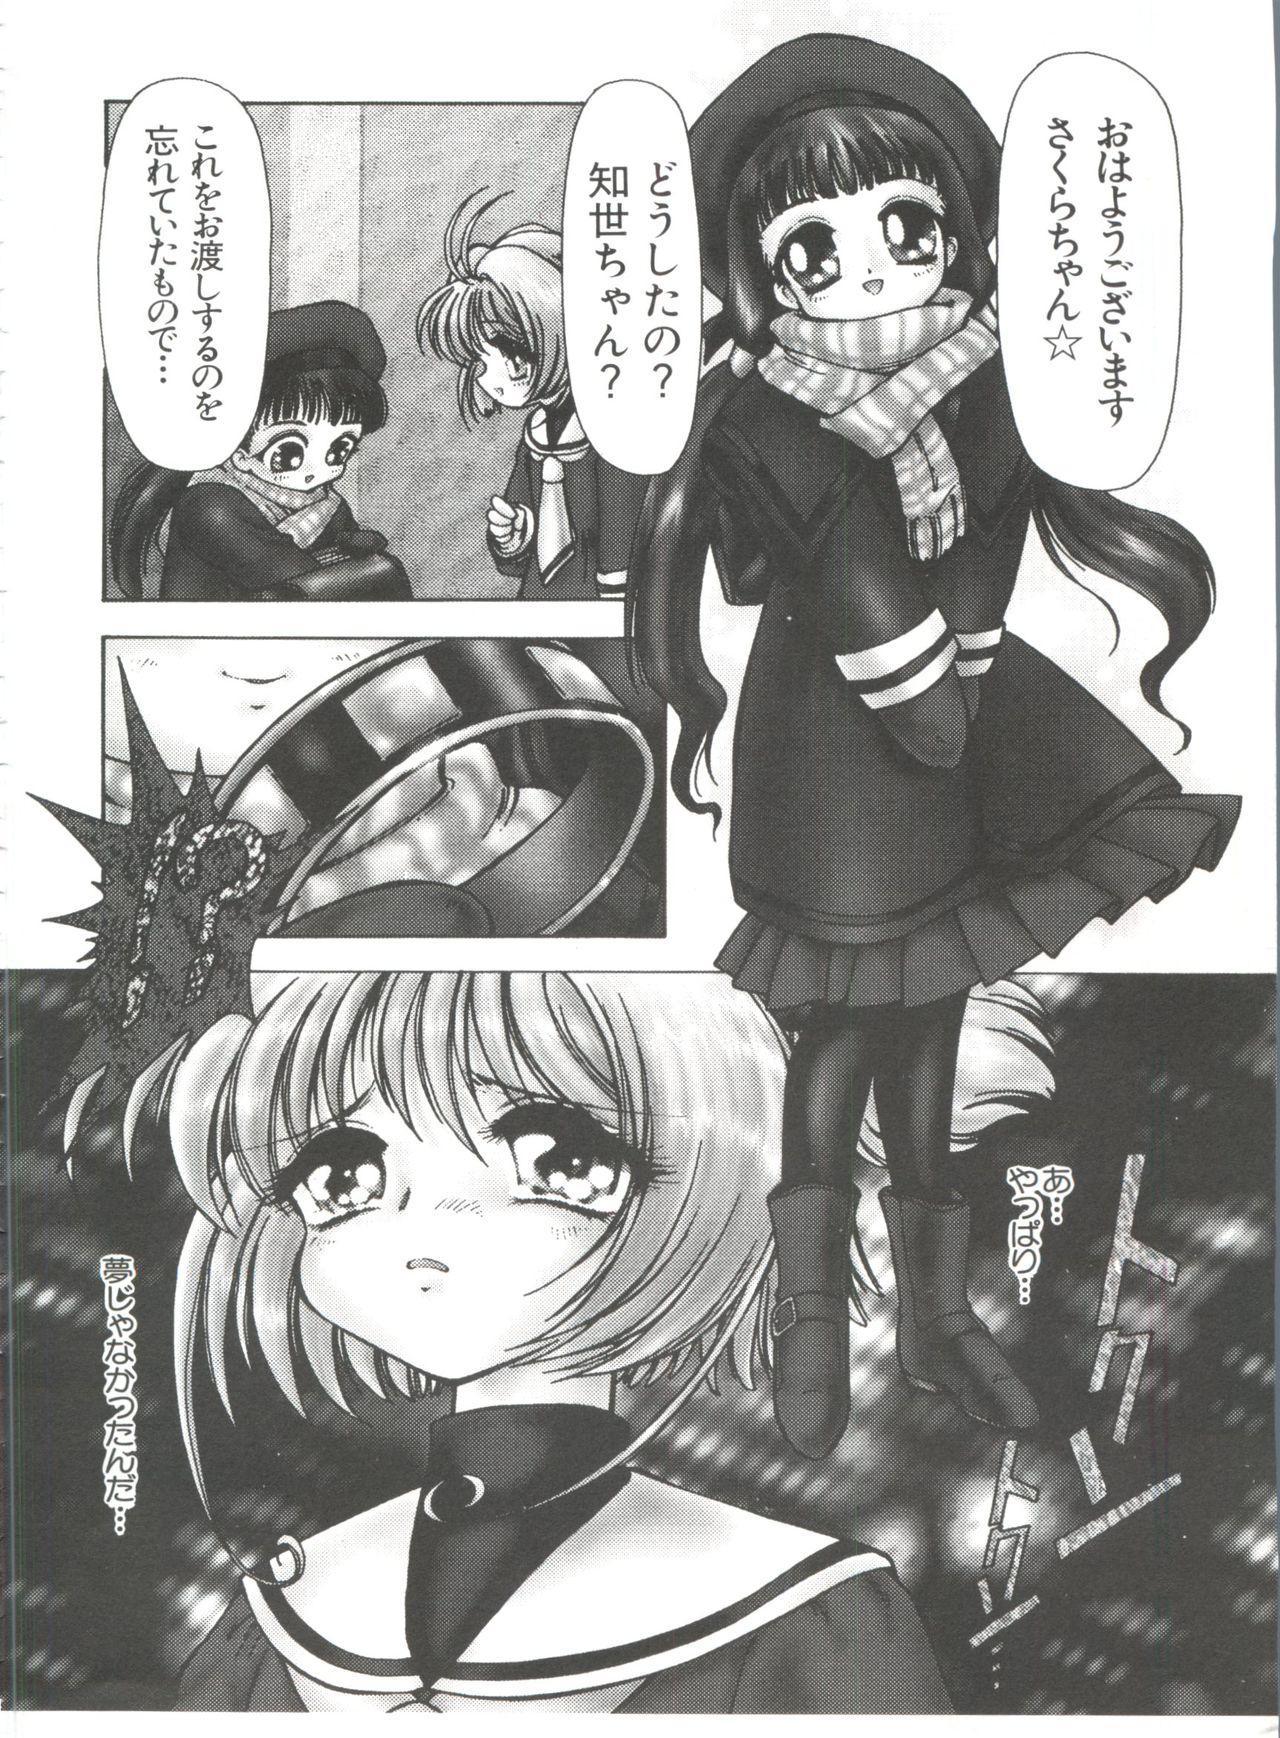 Ero-chan to Issho 3 159